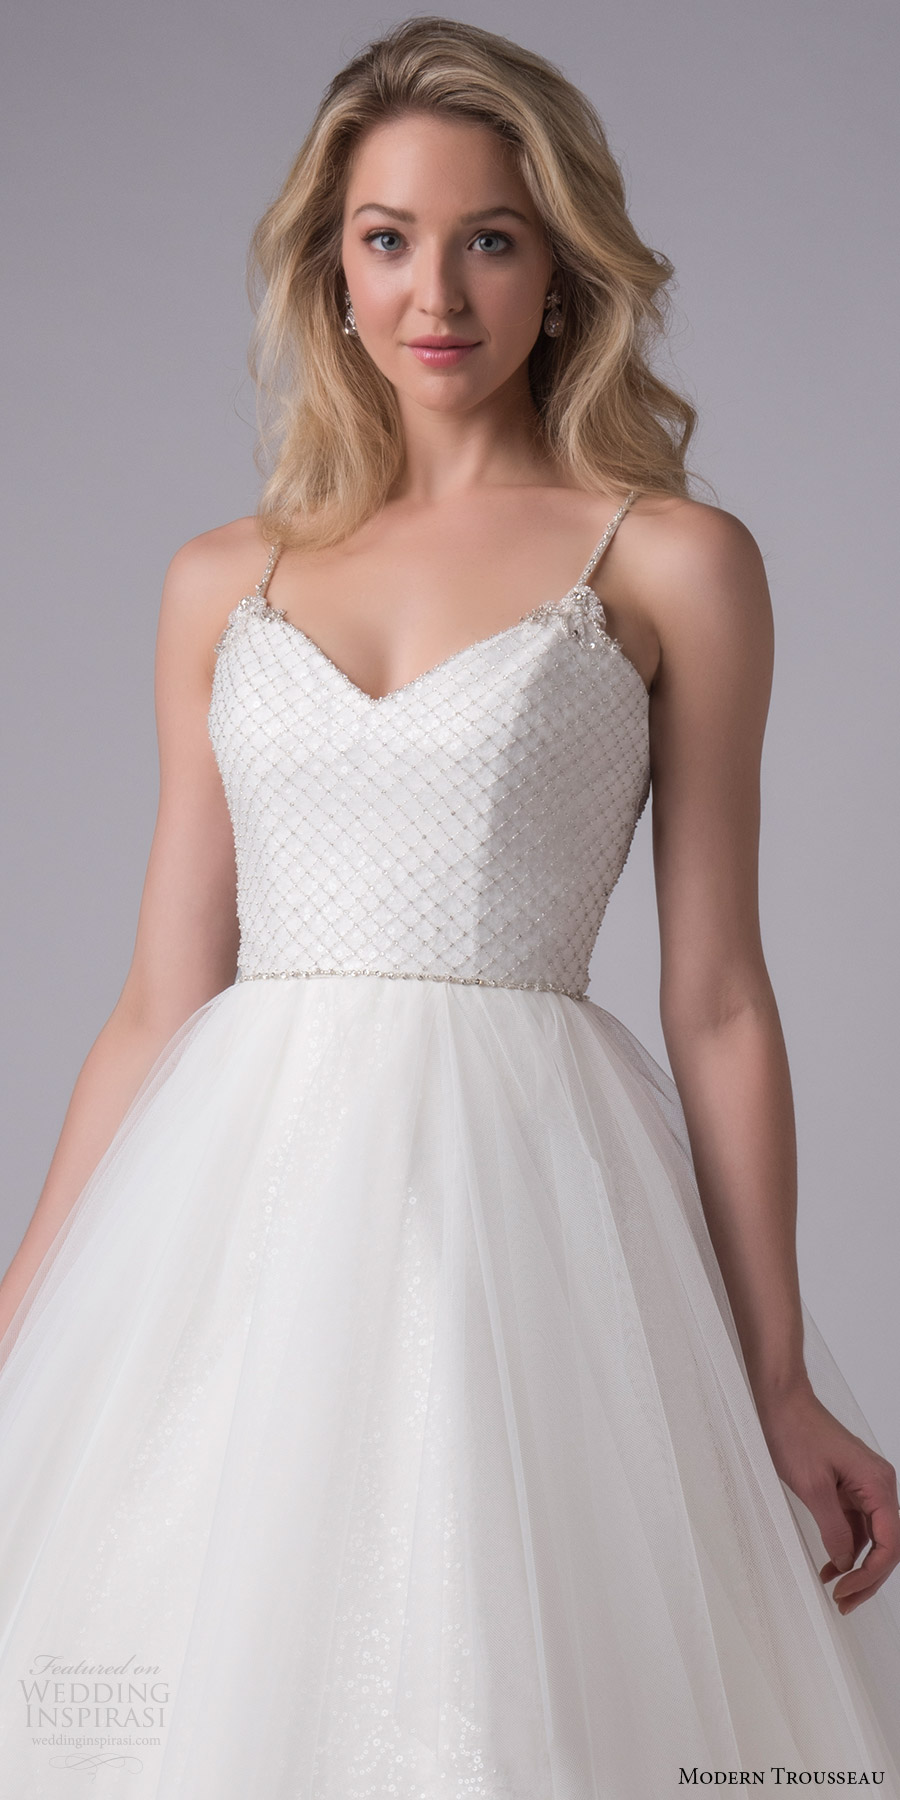 modern trousseau bridal fall 2017 sleeveless vneck beaded bodice spaghetti straps ball gown wedding dress (astrid) zv